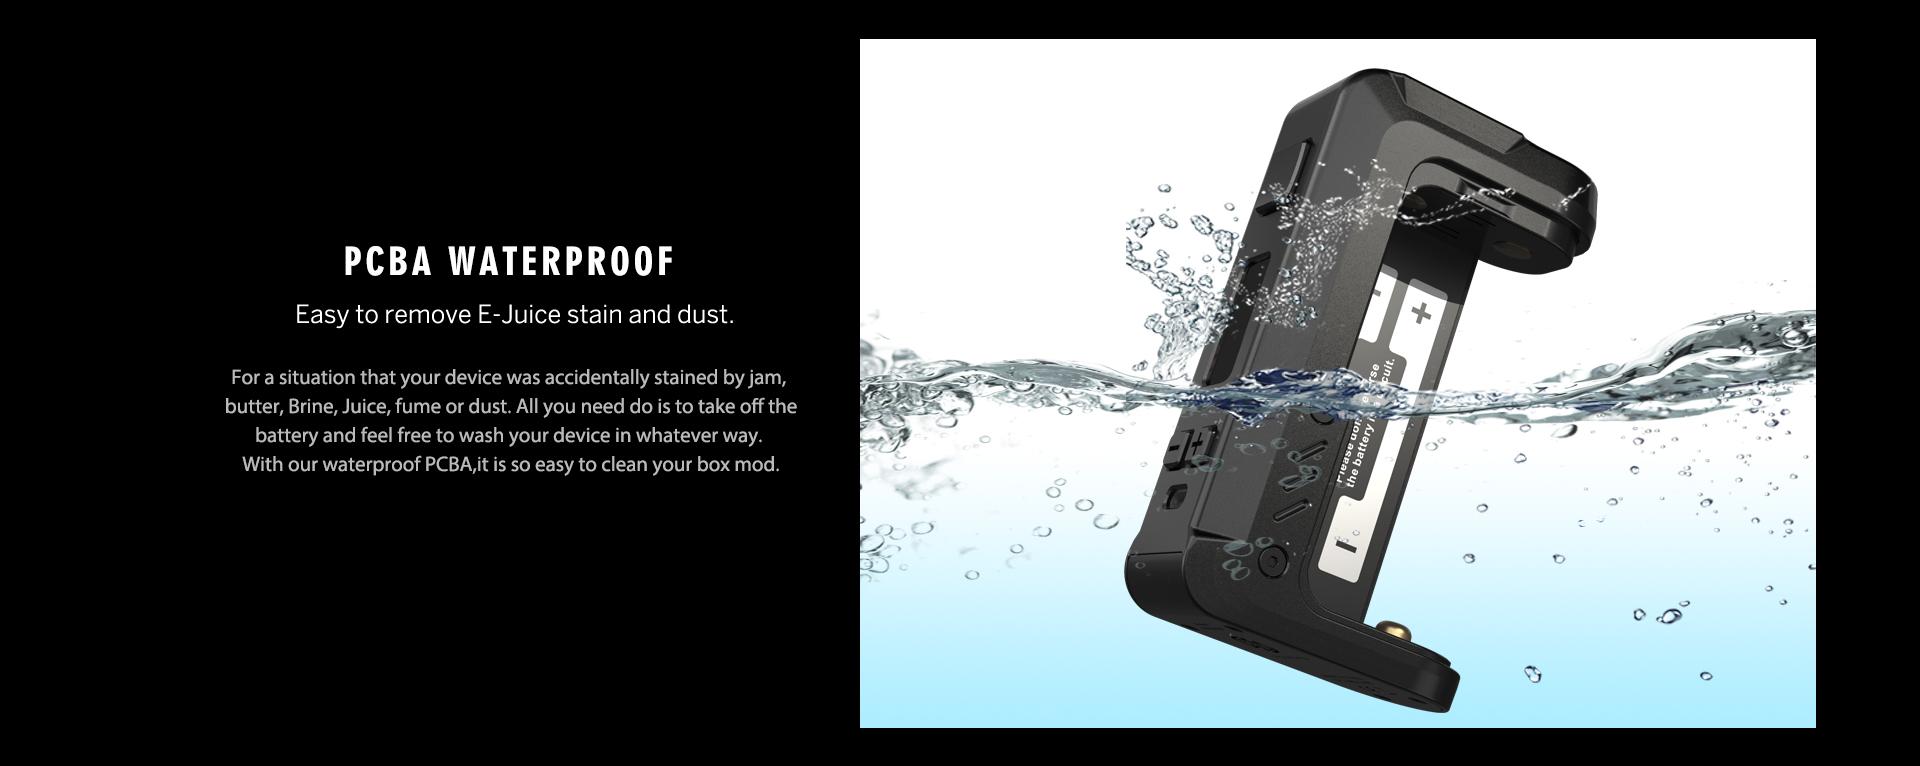 Vandy Vape Gaur-21 Mod - PCBA Waterproof